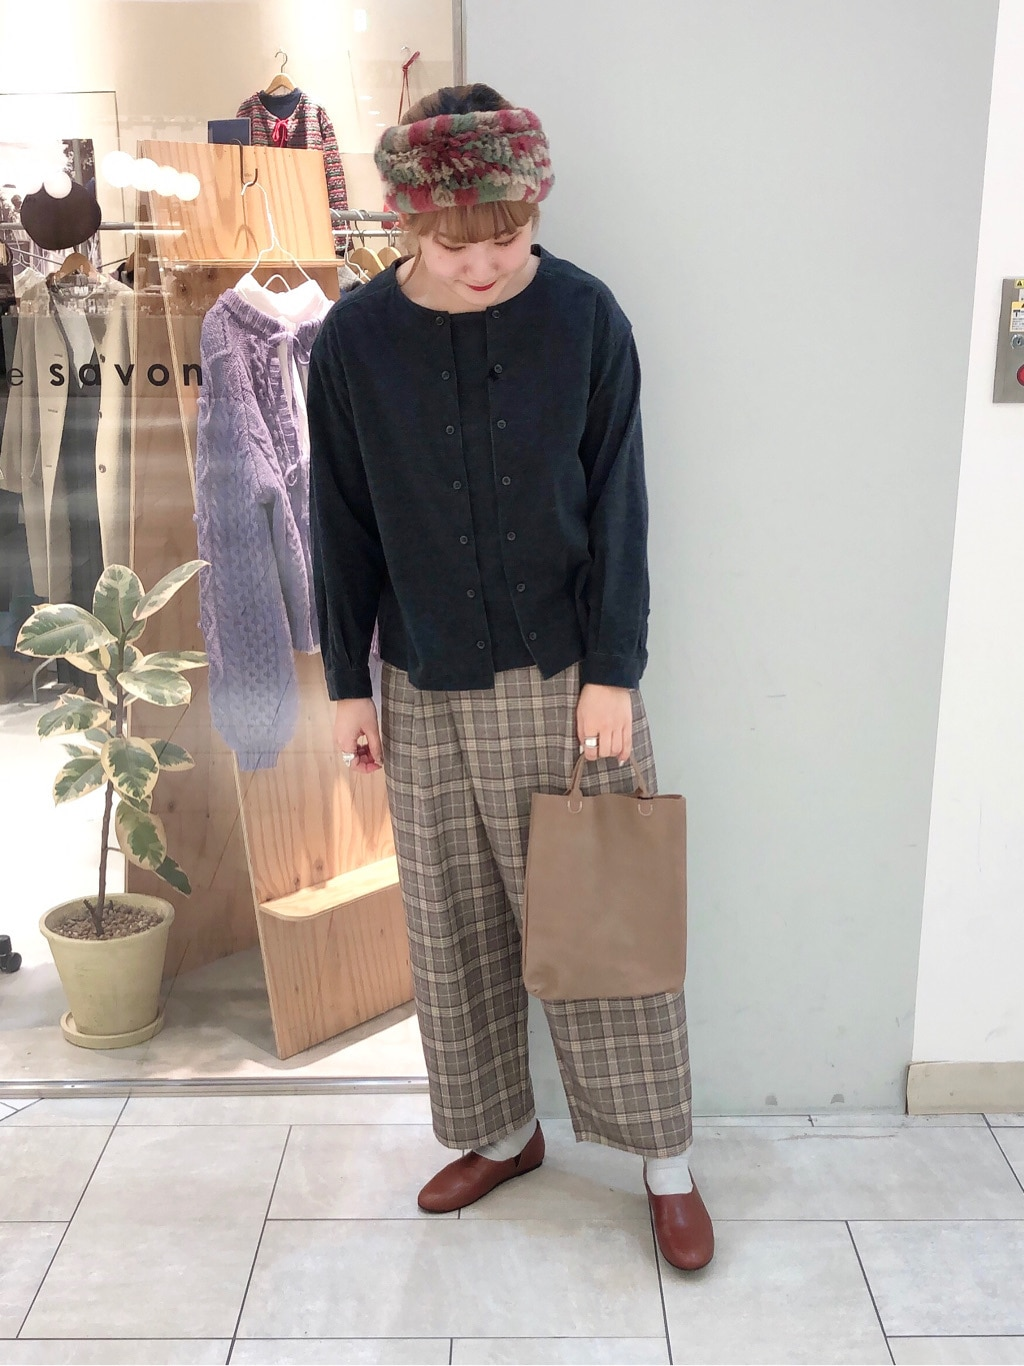 bulle de savon 阪急西宮ガーデンズ 身長:166cm 2019.12.10